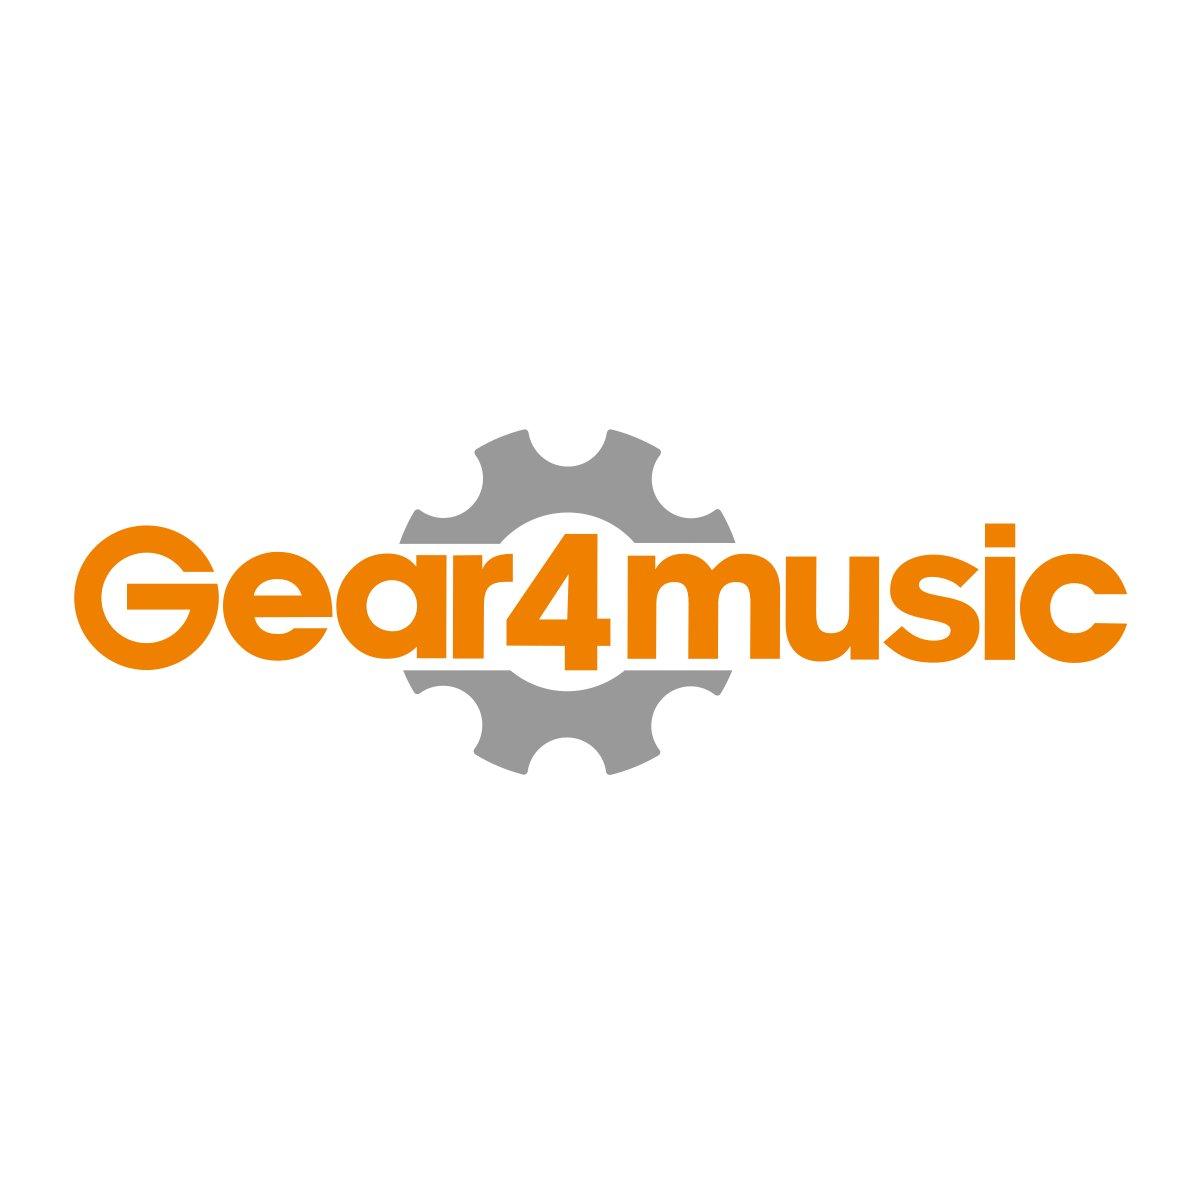 MK-1000 54-key Portable Keyboard by Gear4music - Starter Pack